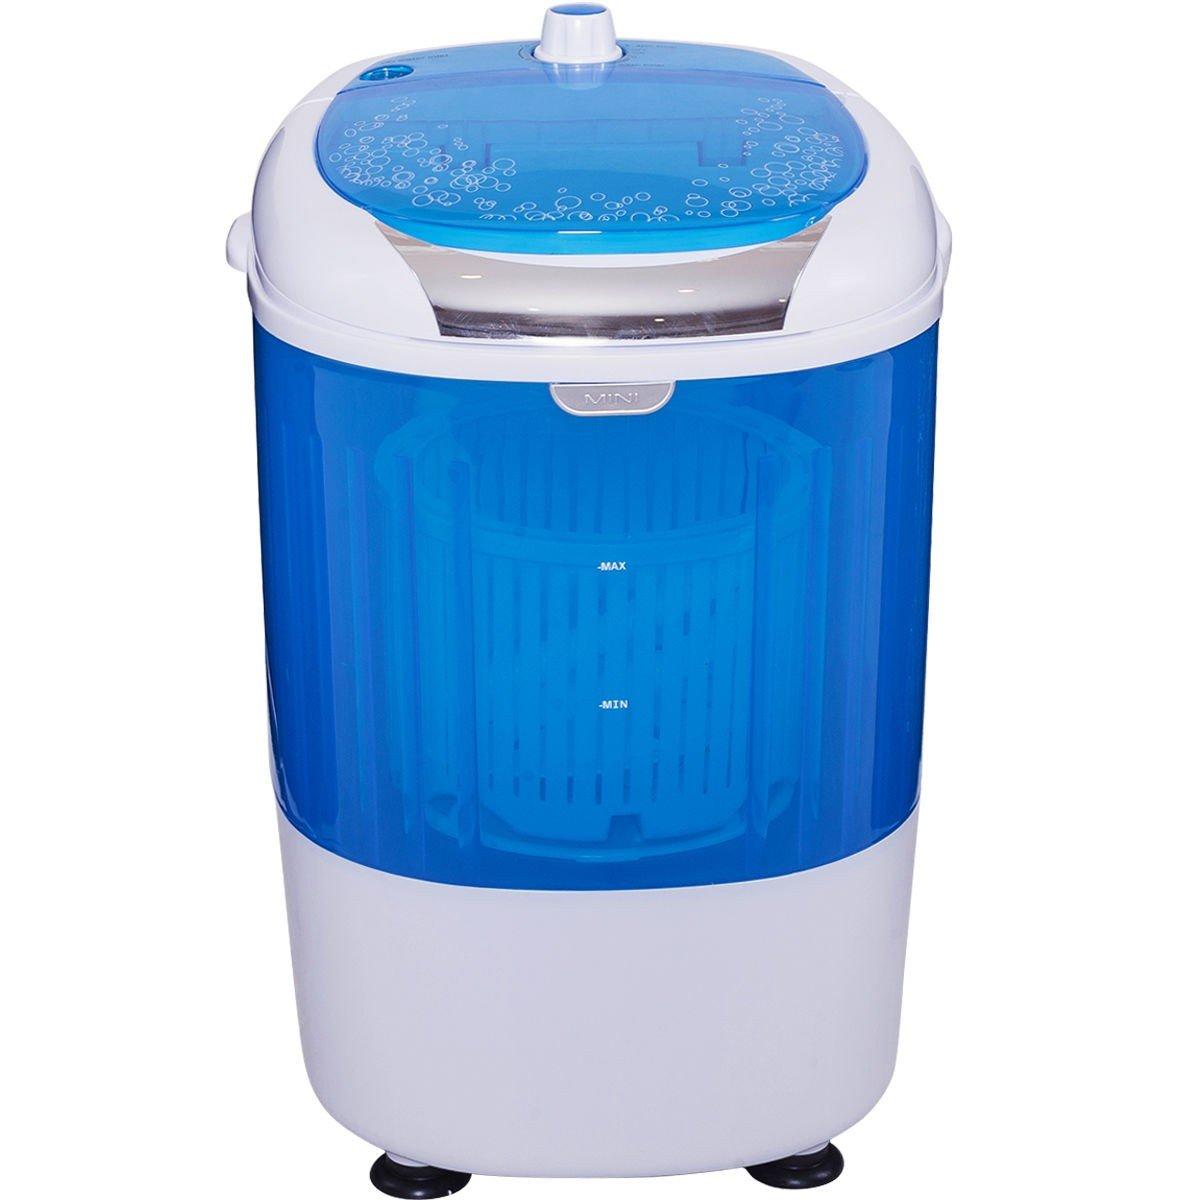 Washing Machine, 5.5 lbs Portable Mini Semi Auto Washing Machine by MD Group (Image #9)